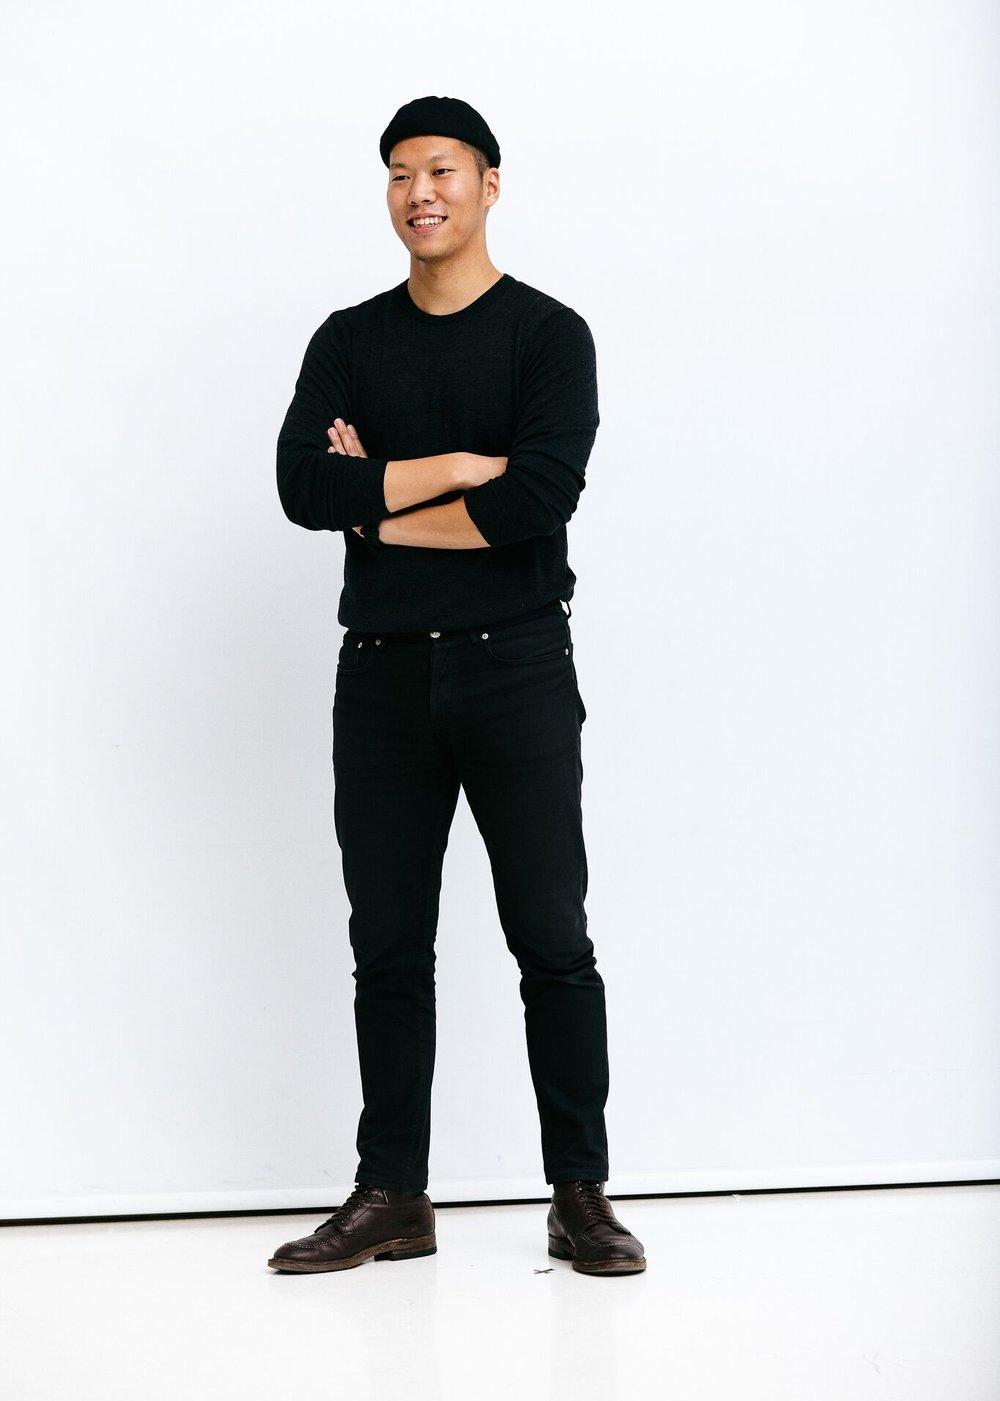 Kilian Son   Content Director